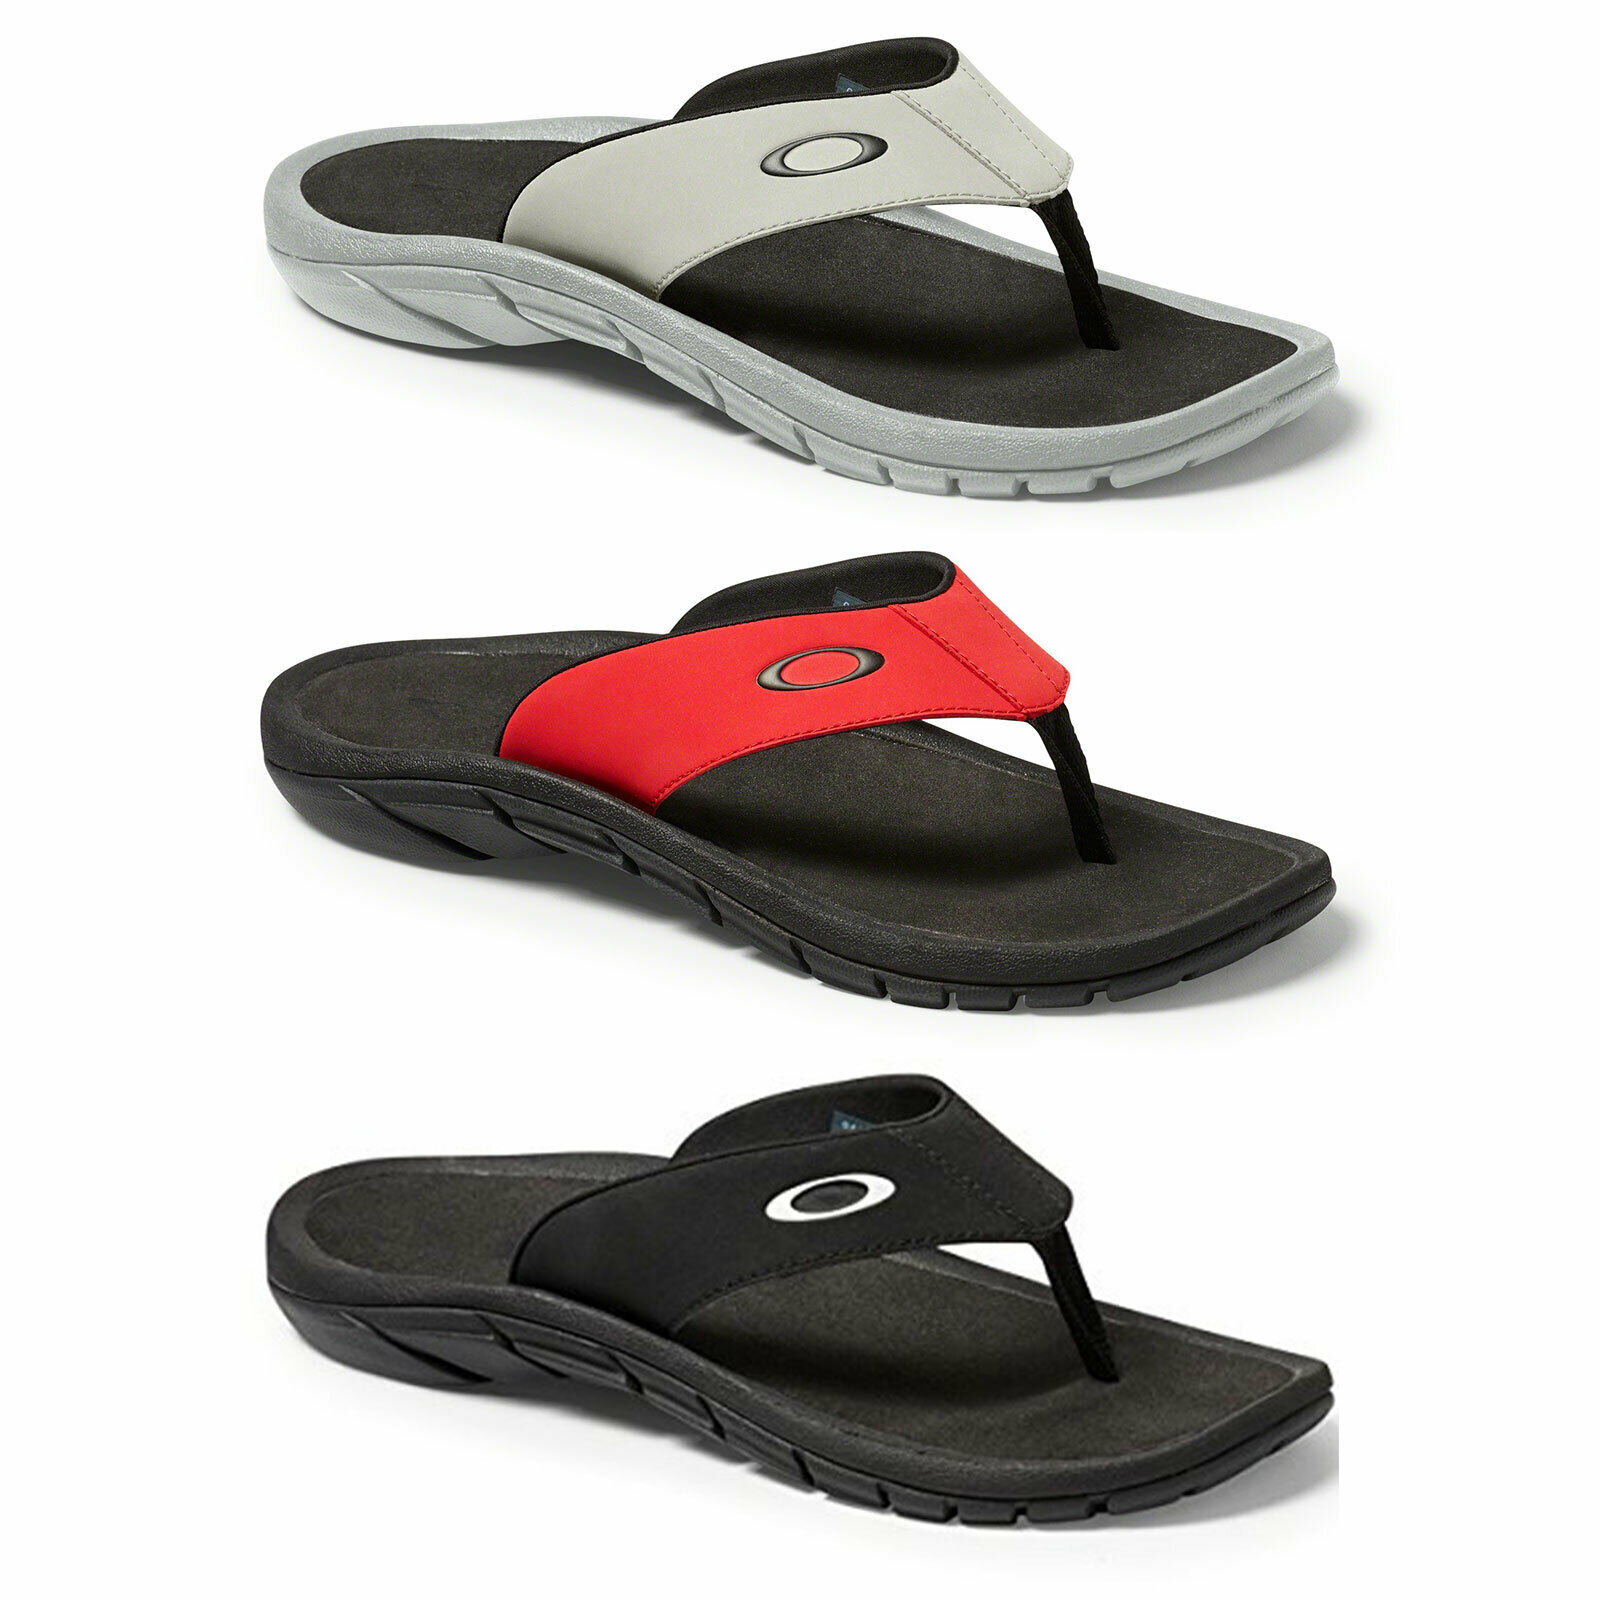 7203e9db431 Oakley Super Coil Black Flip Flops Thong Sandals UK 5 EU 38.5 USA 6 for  sale online